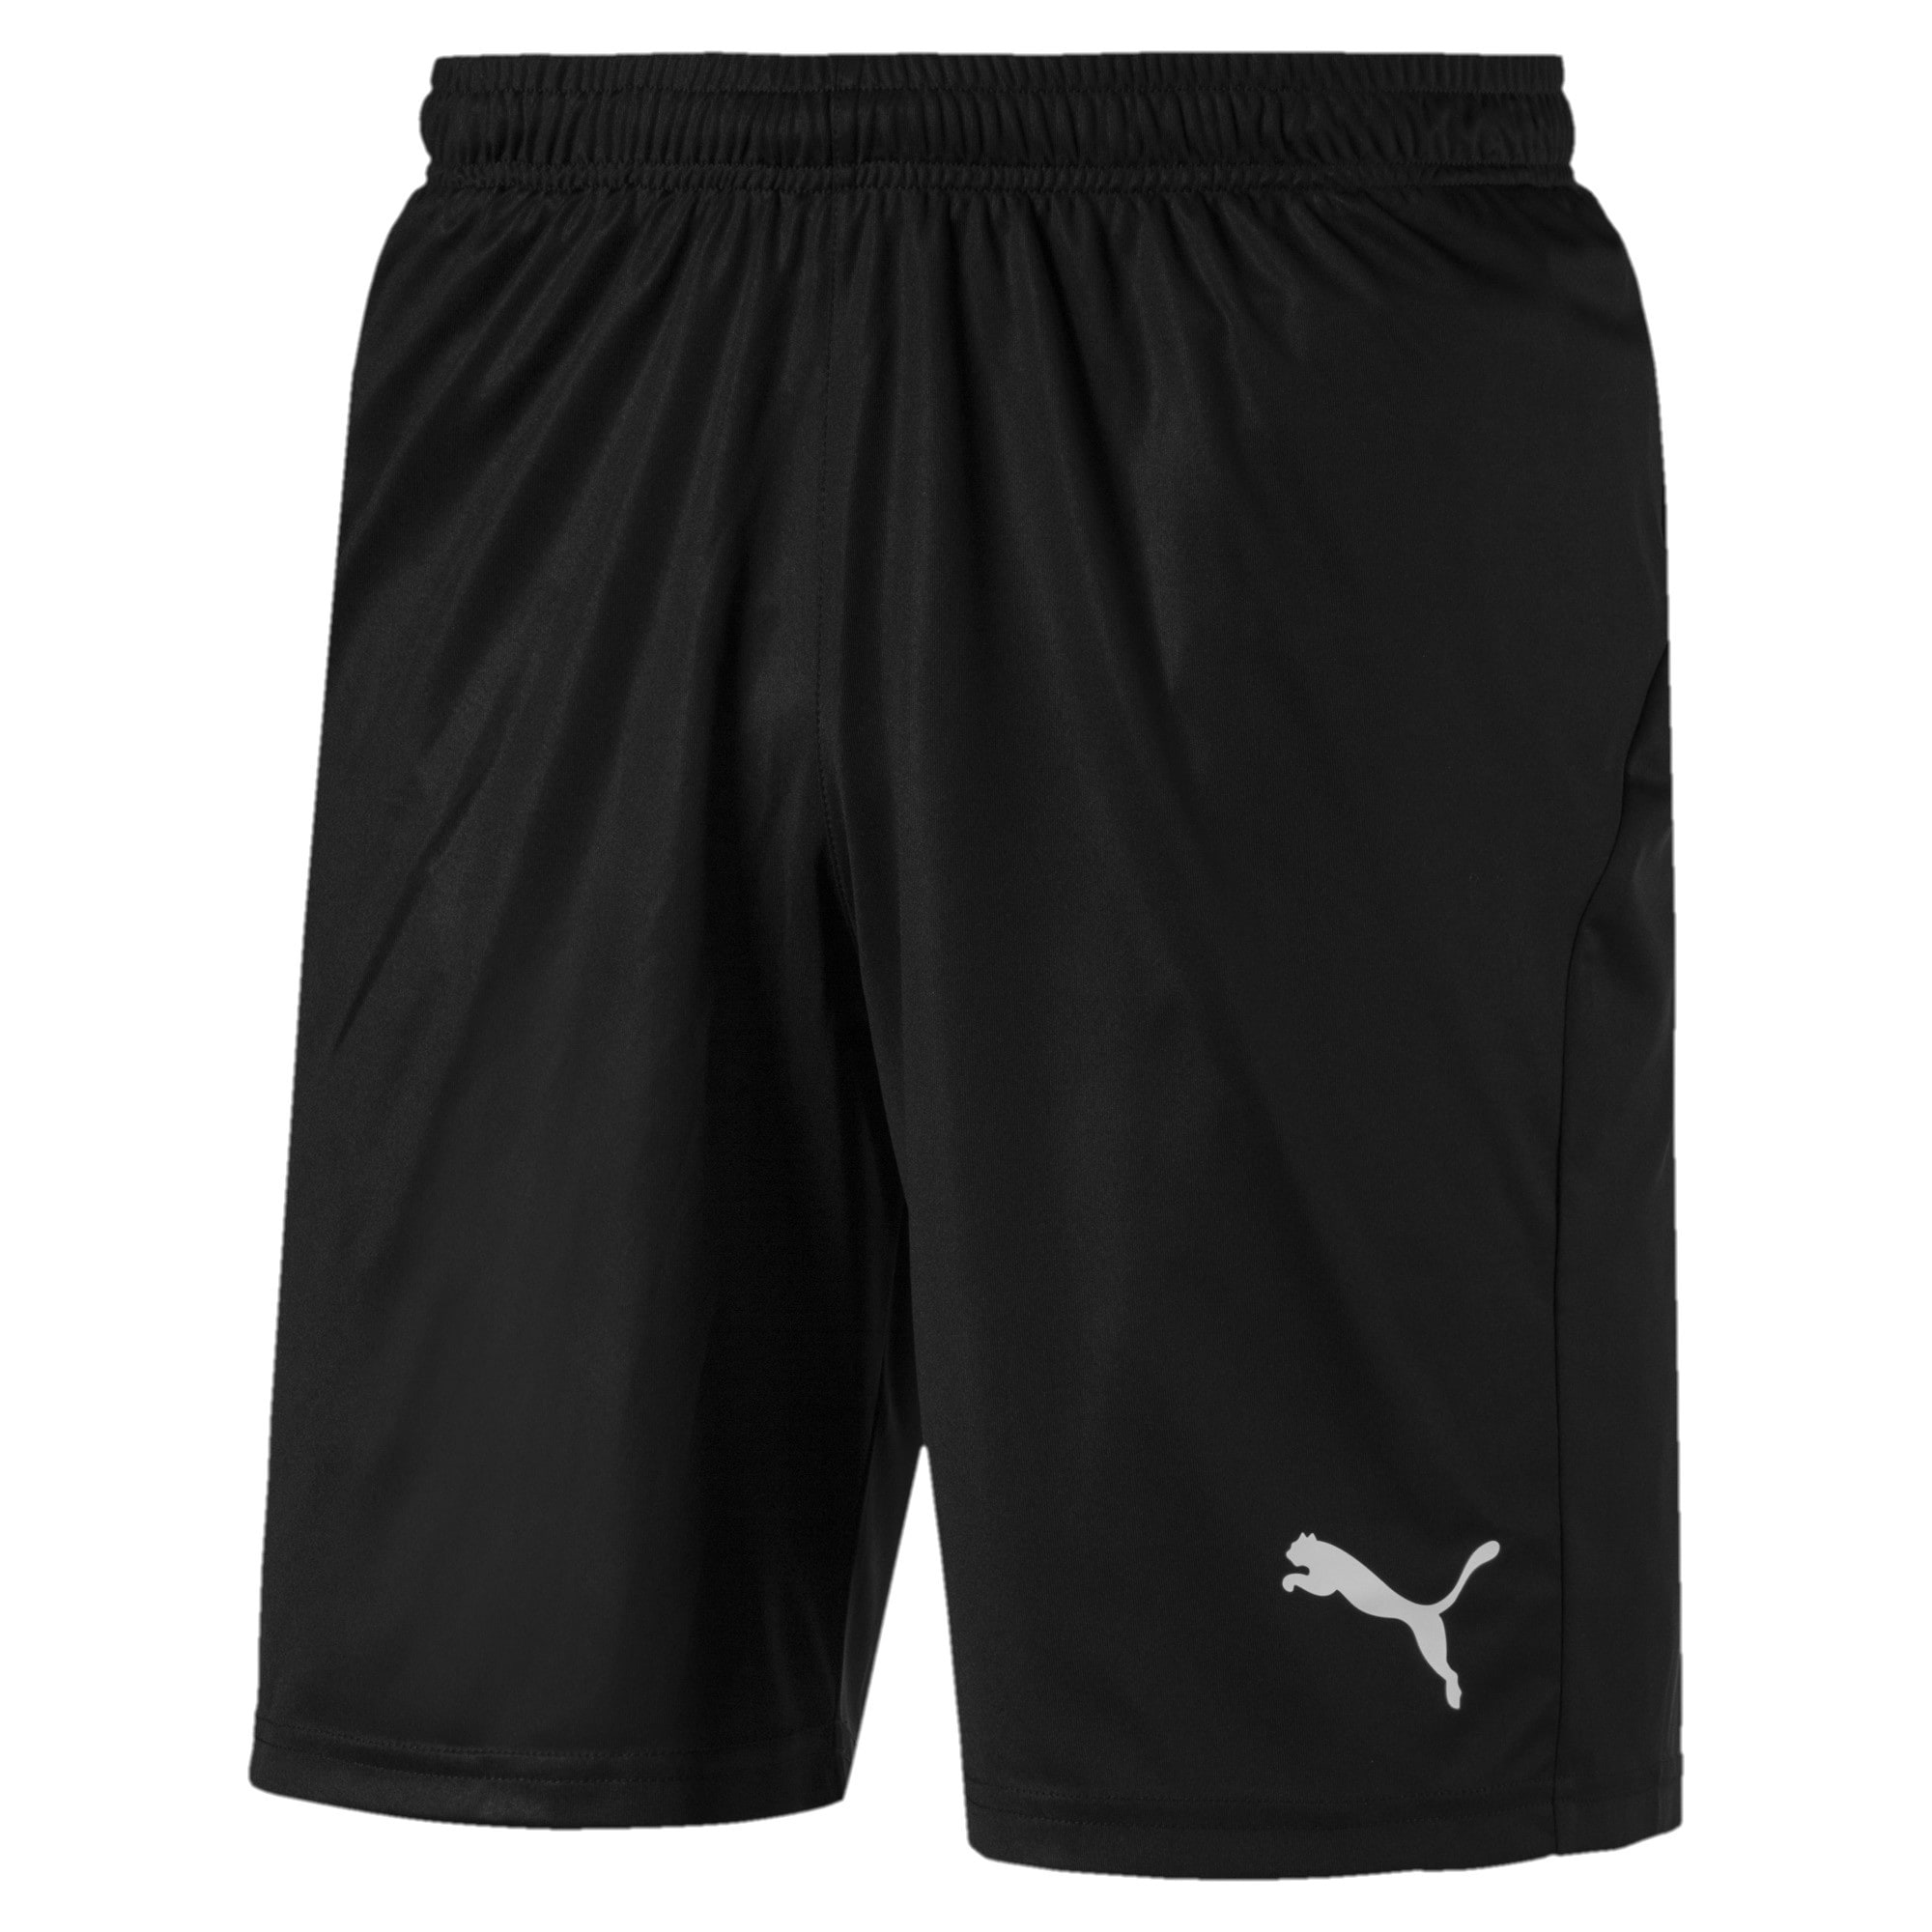 Thumbnail 4 of Liga Core Men's Shorts, Puma Black-Puma White, medium